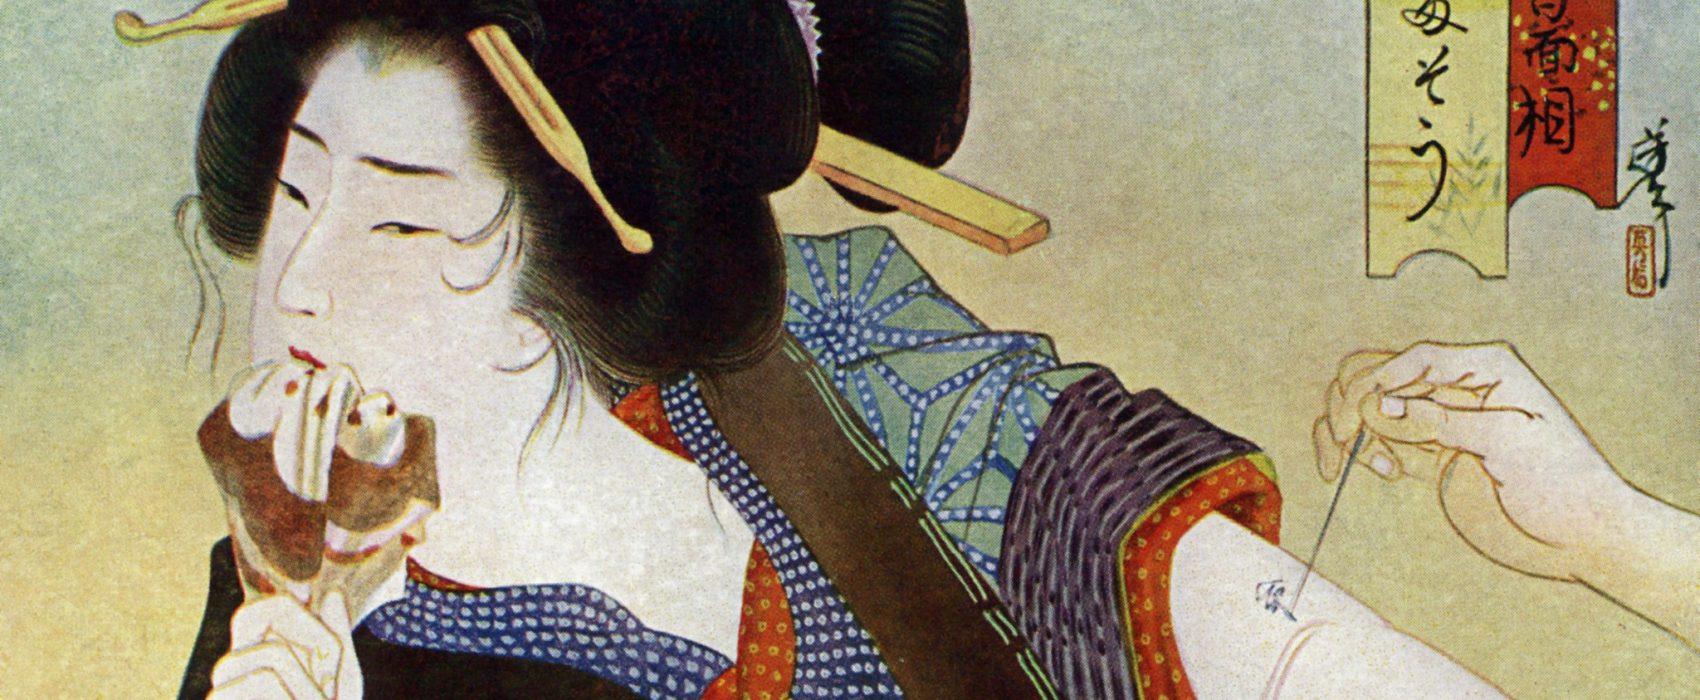 tattoos edo period japan